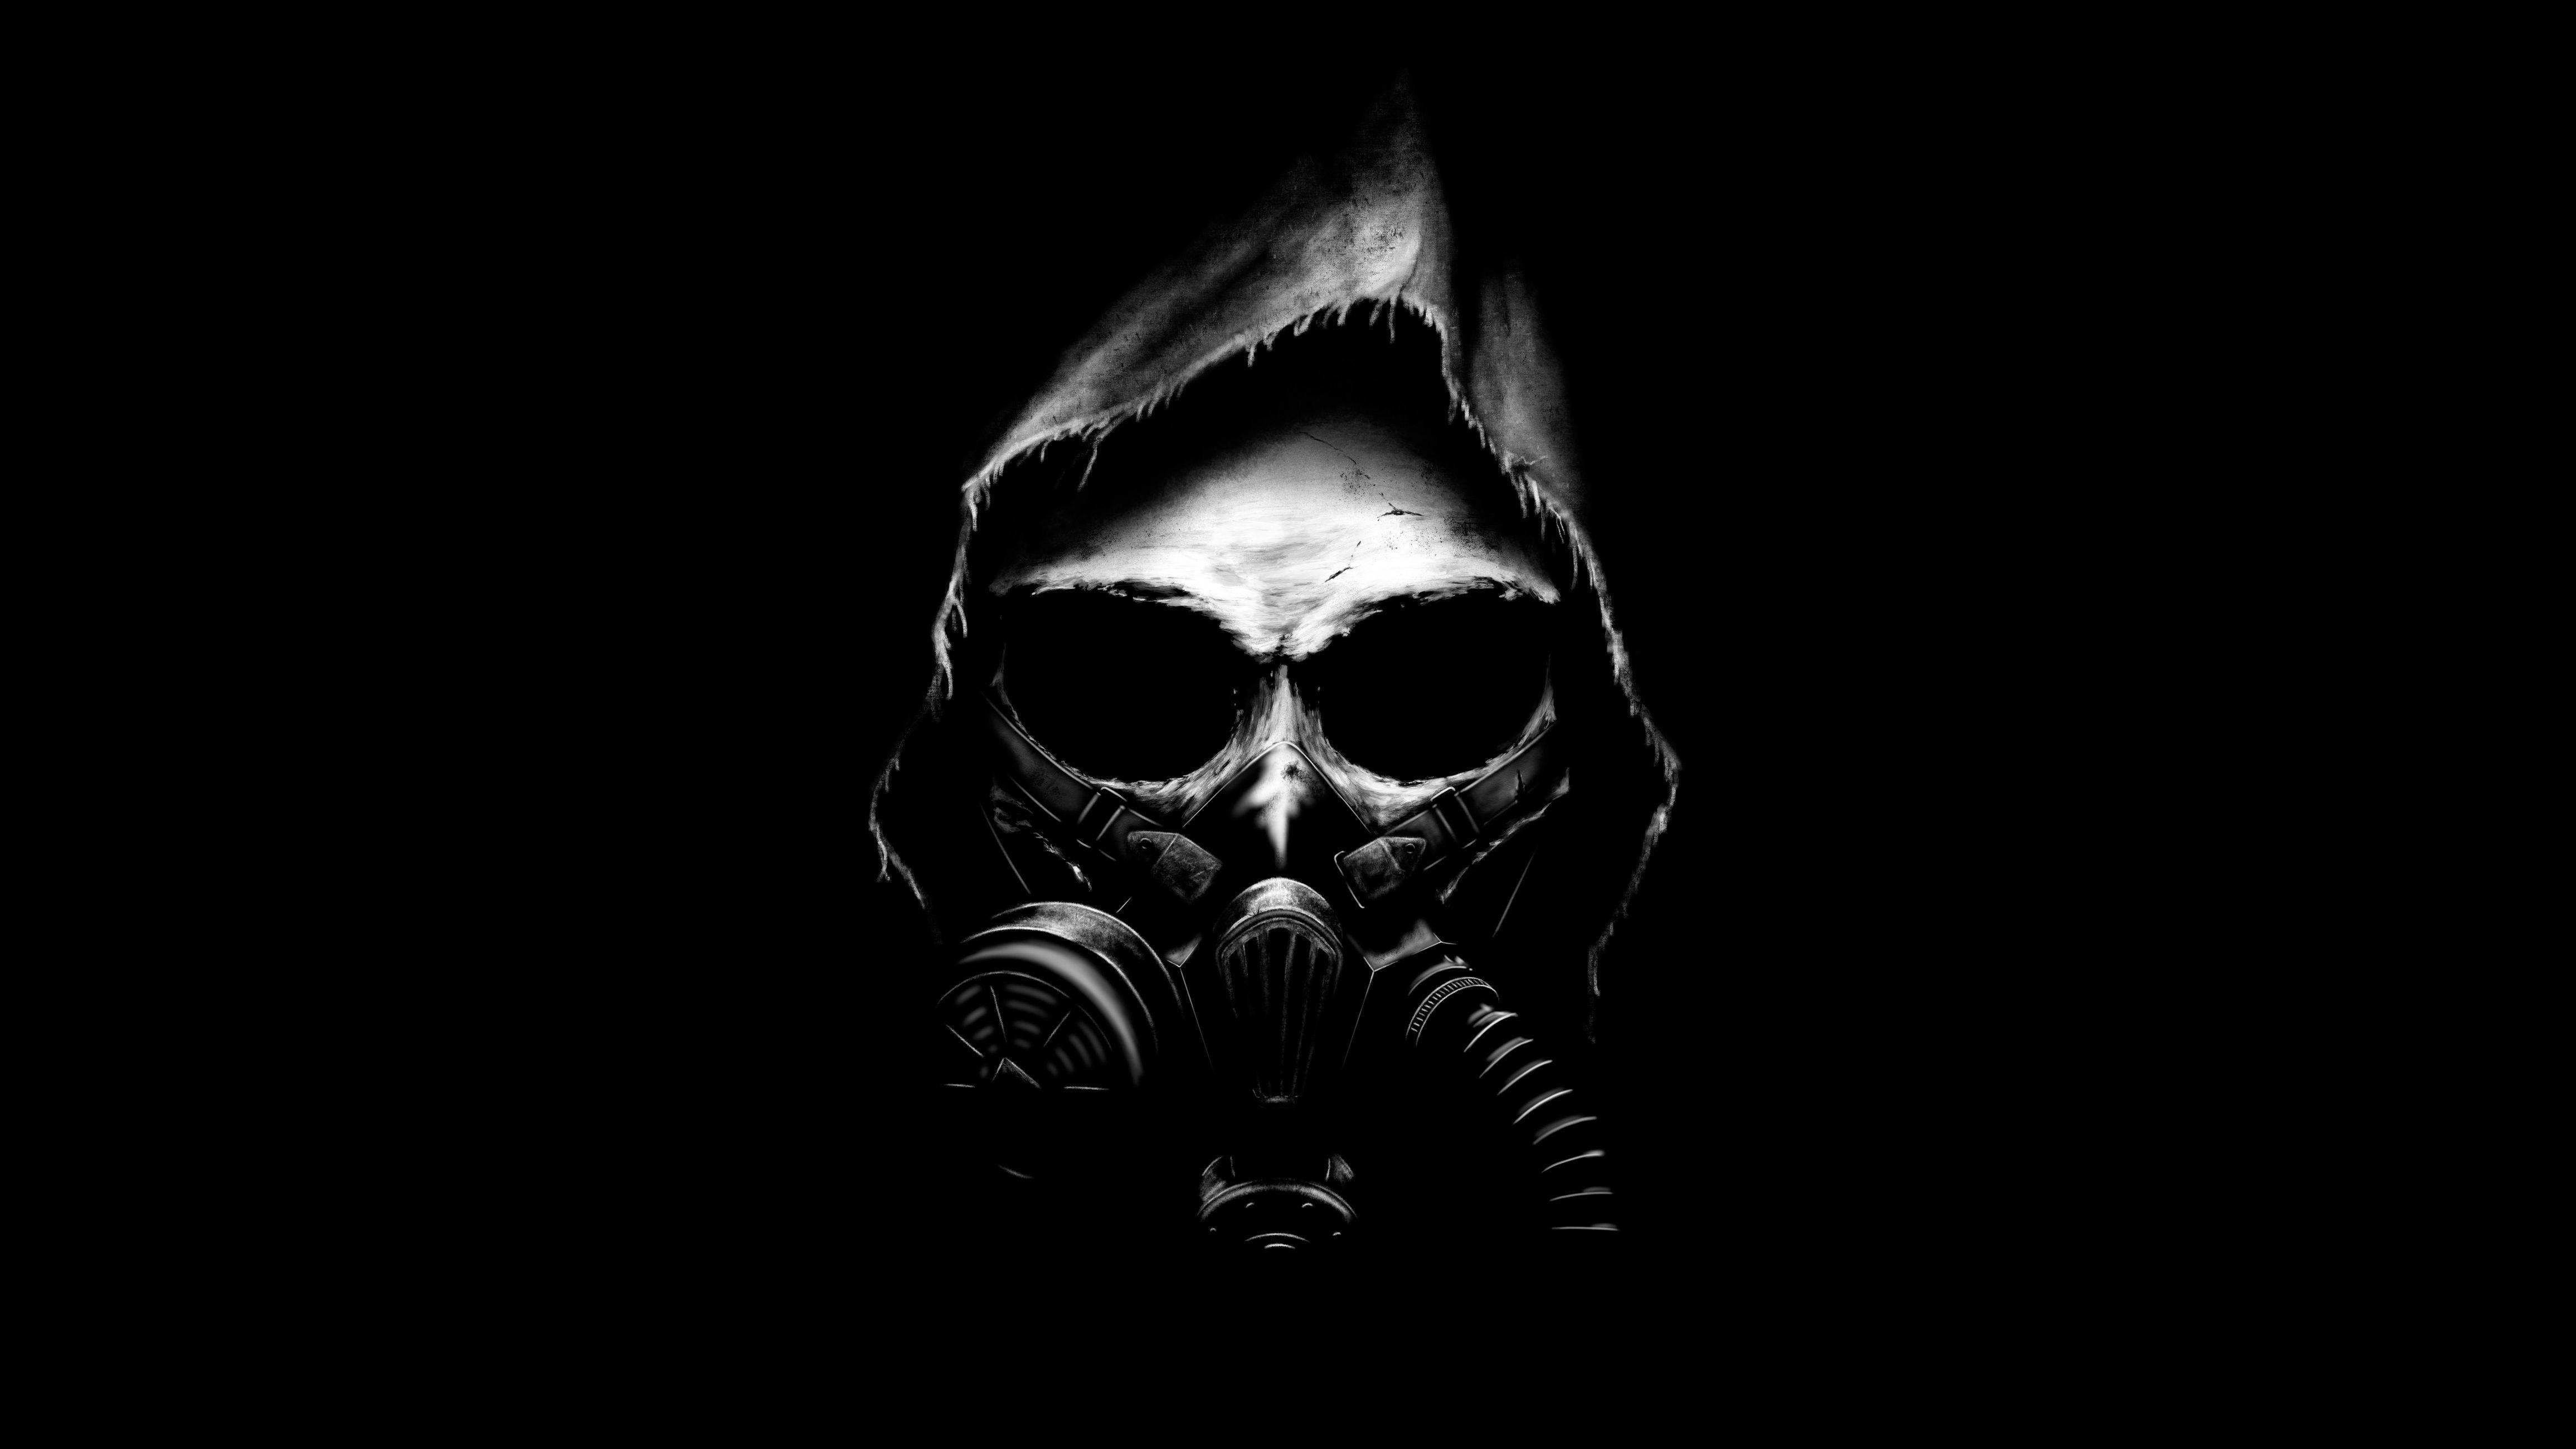 Apocalyptic Skull 4k Apocalyptic Skull 4k Skull Wallpaper Black Skulls Wallpaper Dark Backgrounds